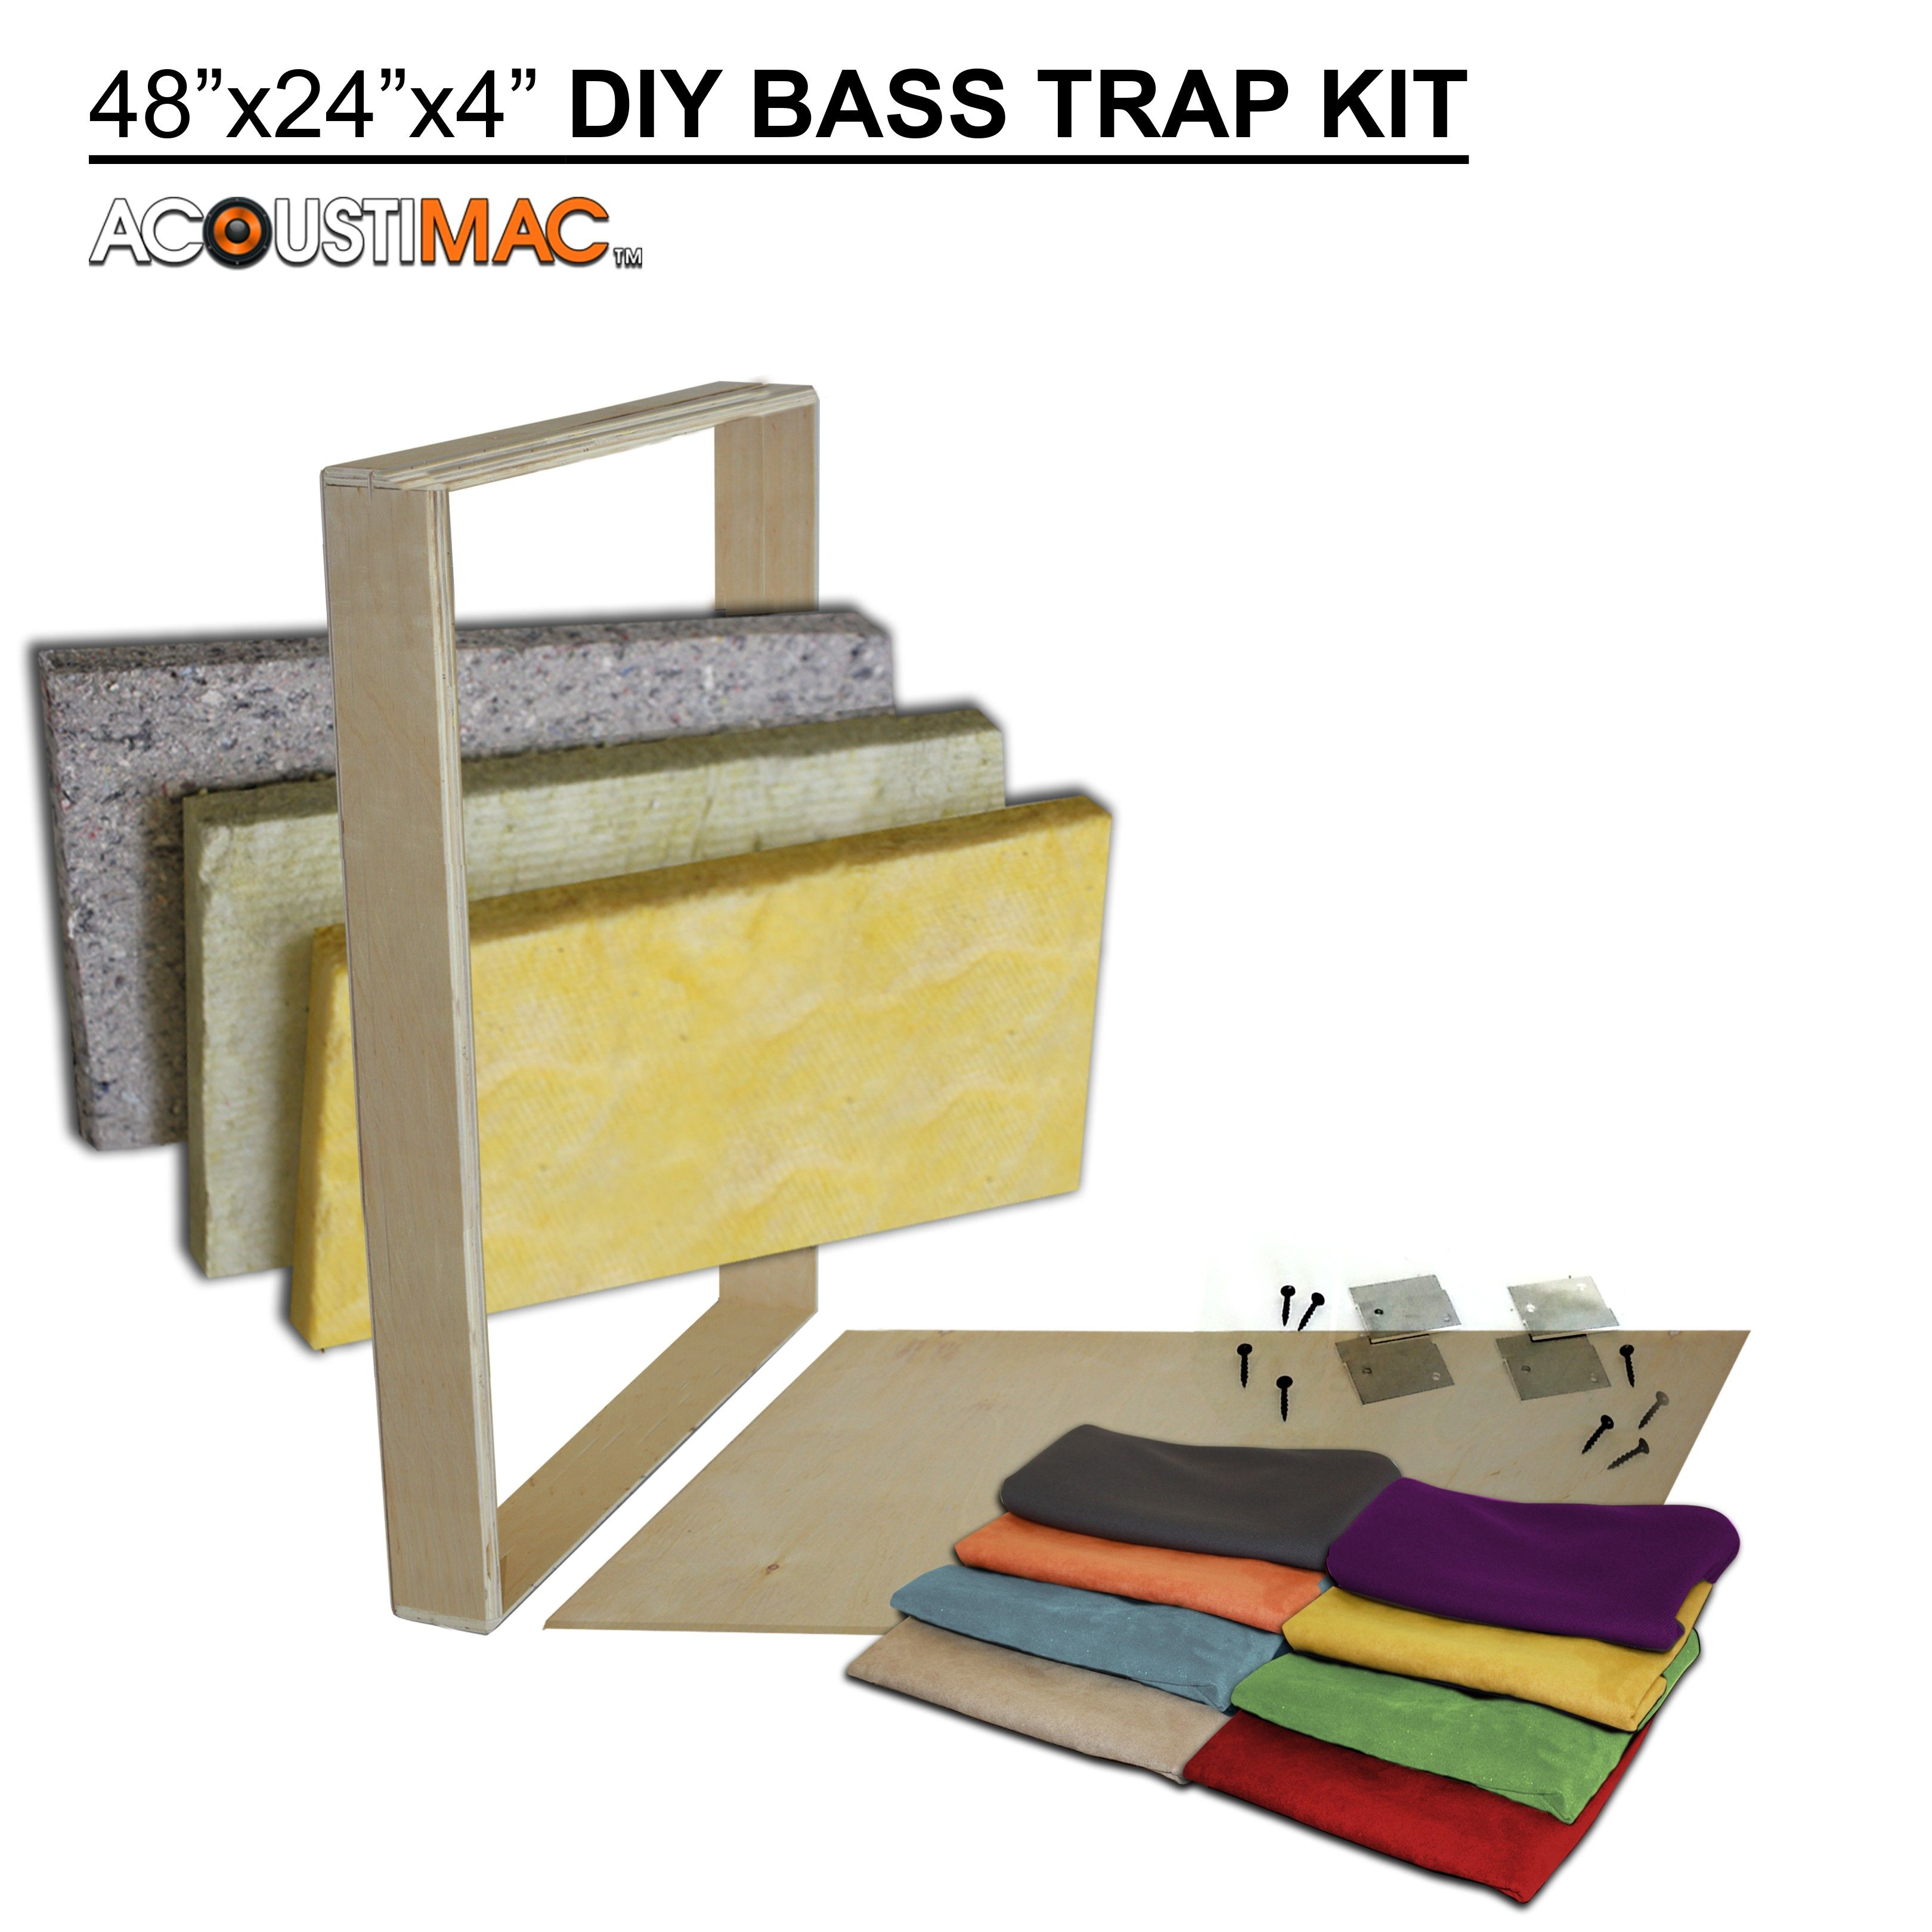 Acoustimac diy424 bass trap kit acoustic panels